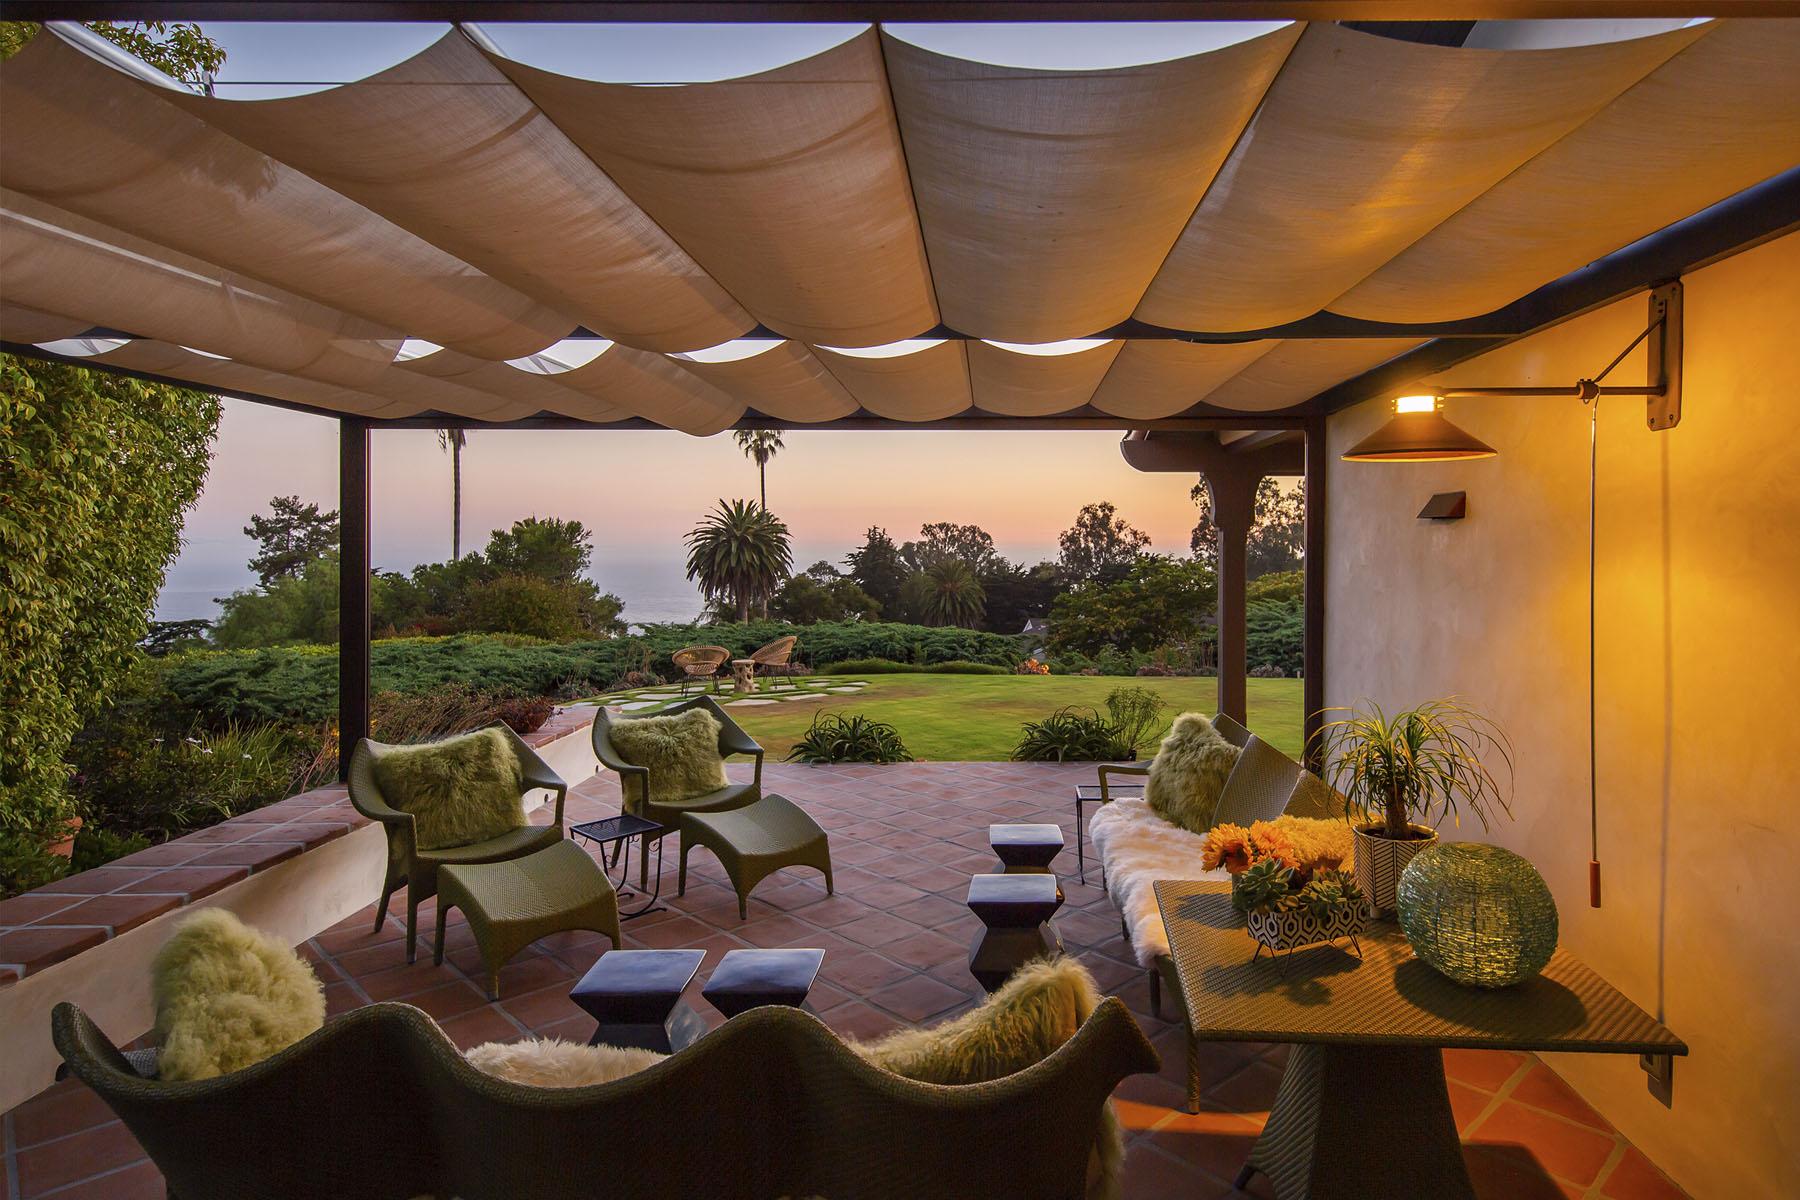 Campanil patio; Hope Ranch